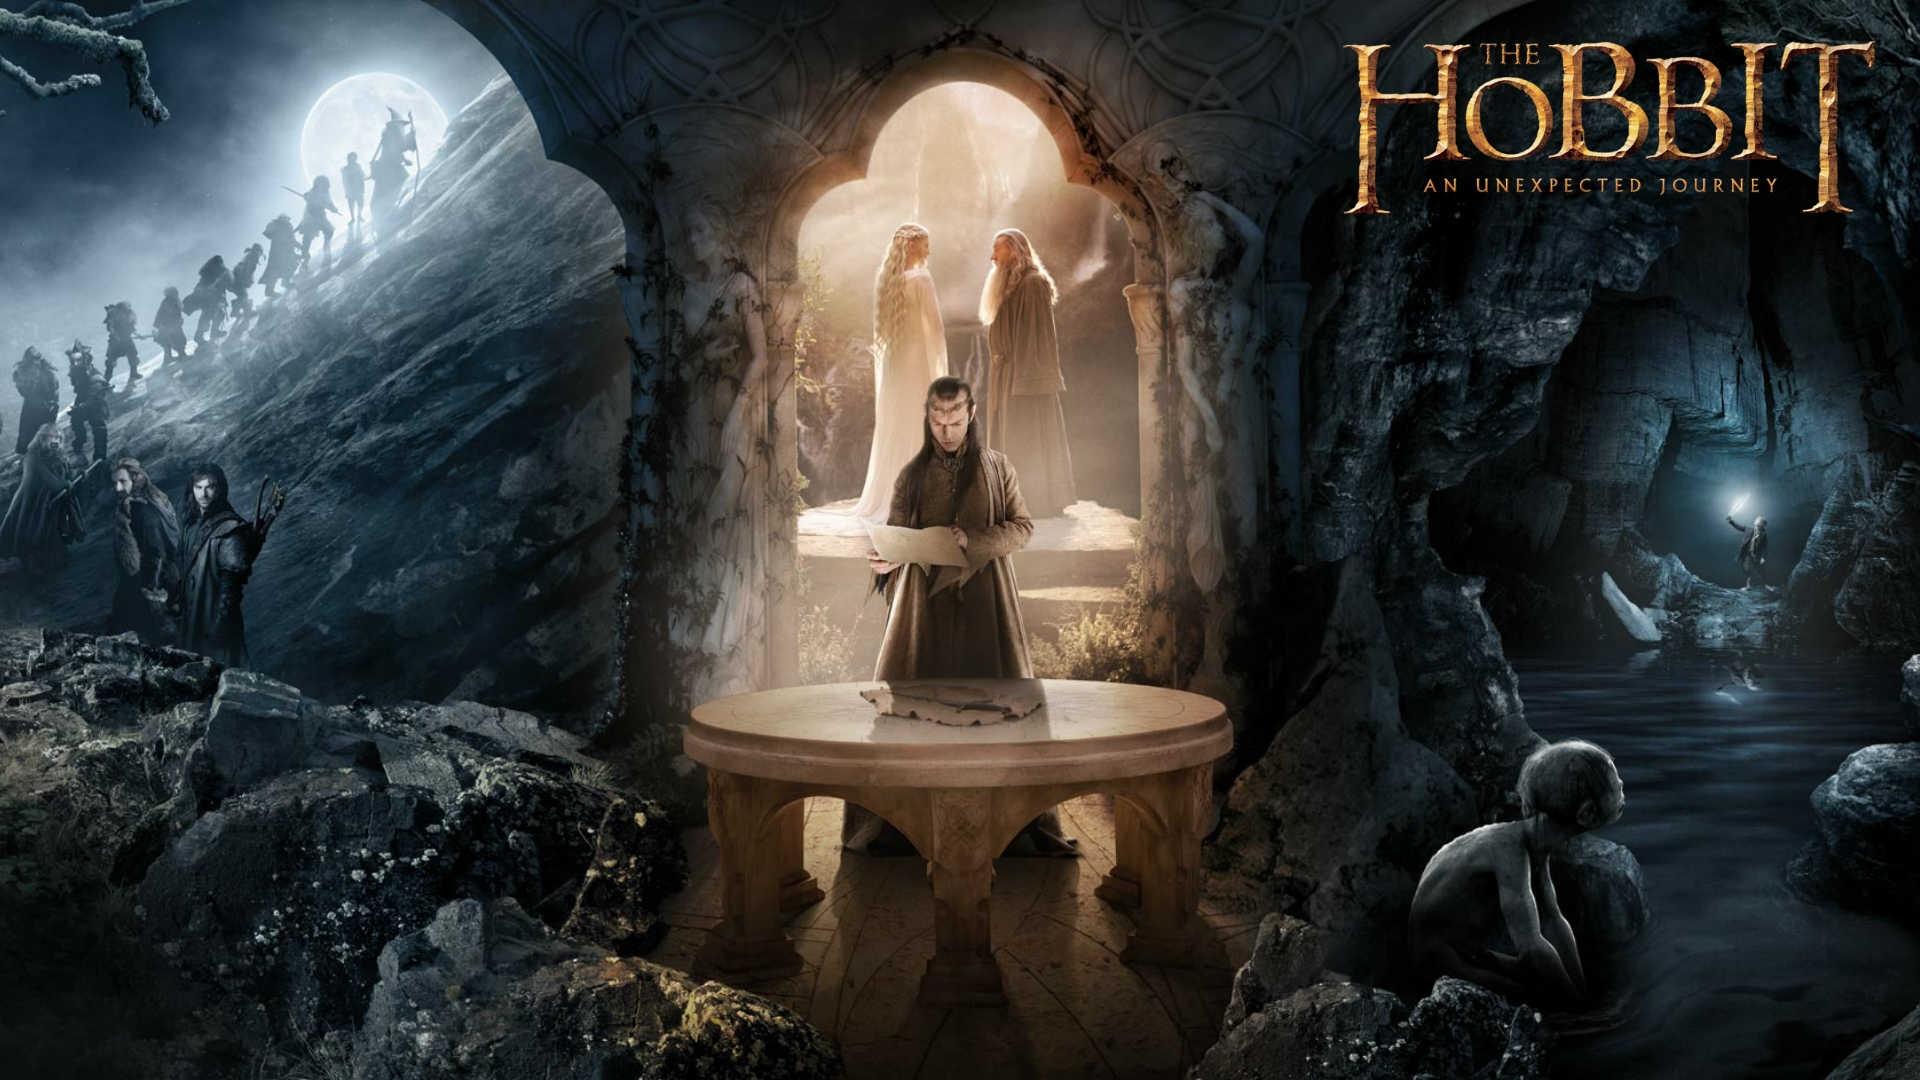 Elrond   The Hobbit An Unexpected Journey Wallpaper 1920x1080 1920x1080